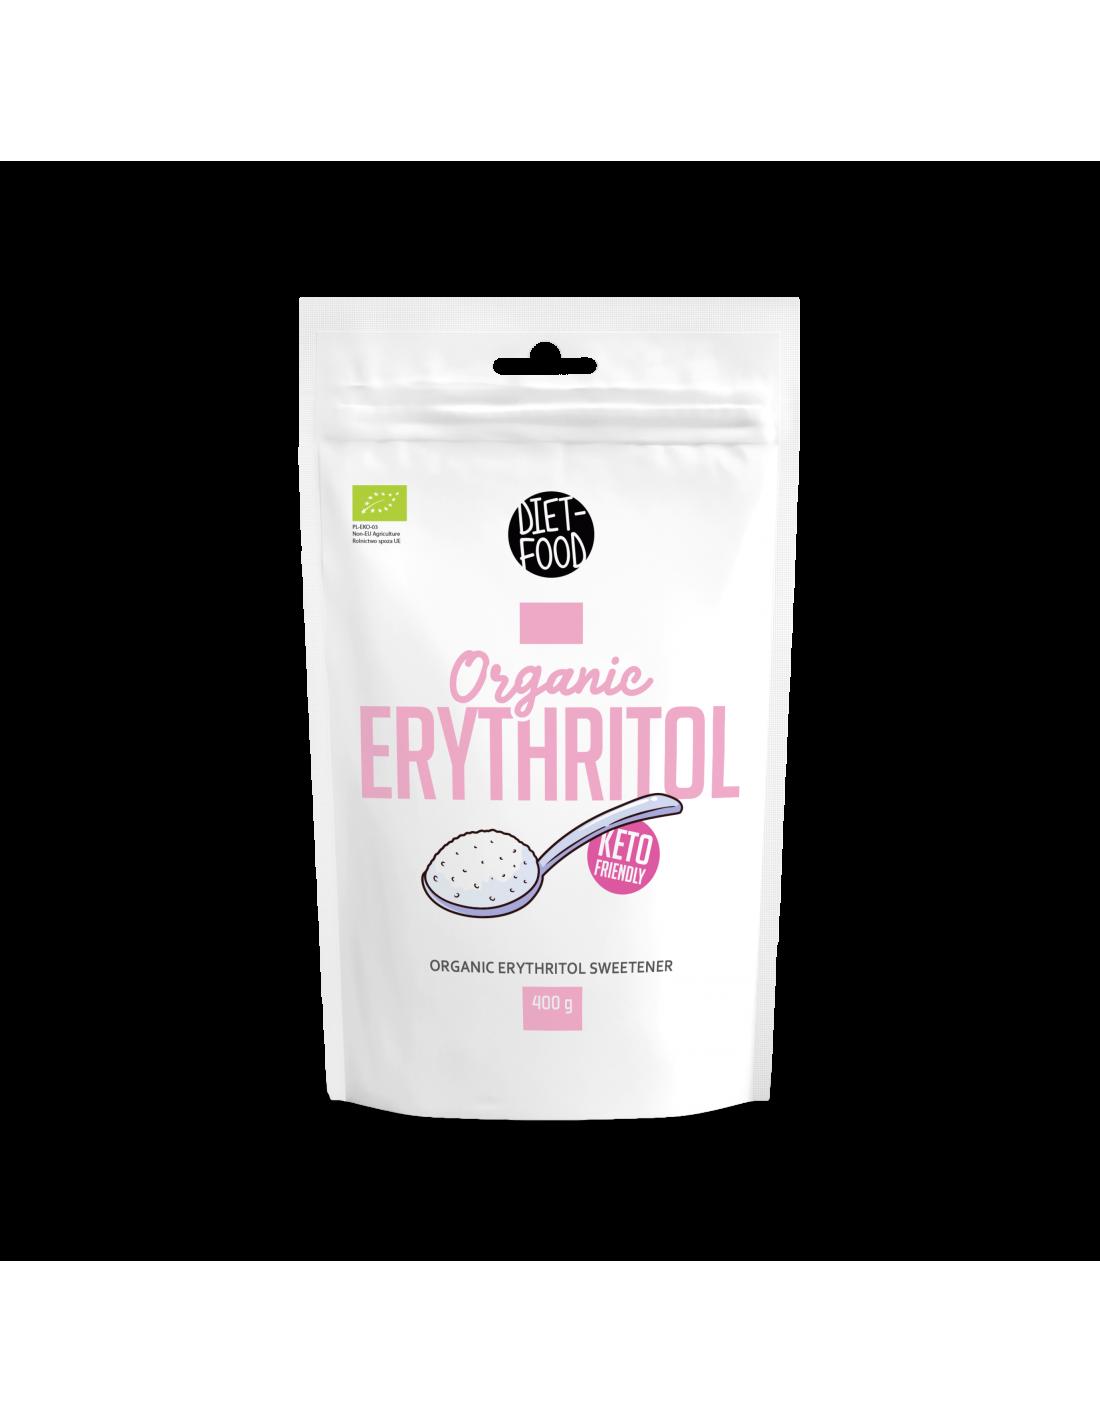 DIETFOOD - ORGANIC ERYTHRITOL 400G